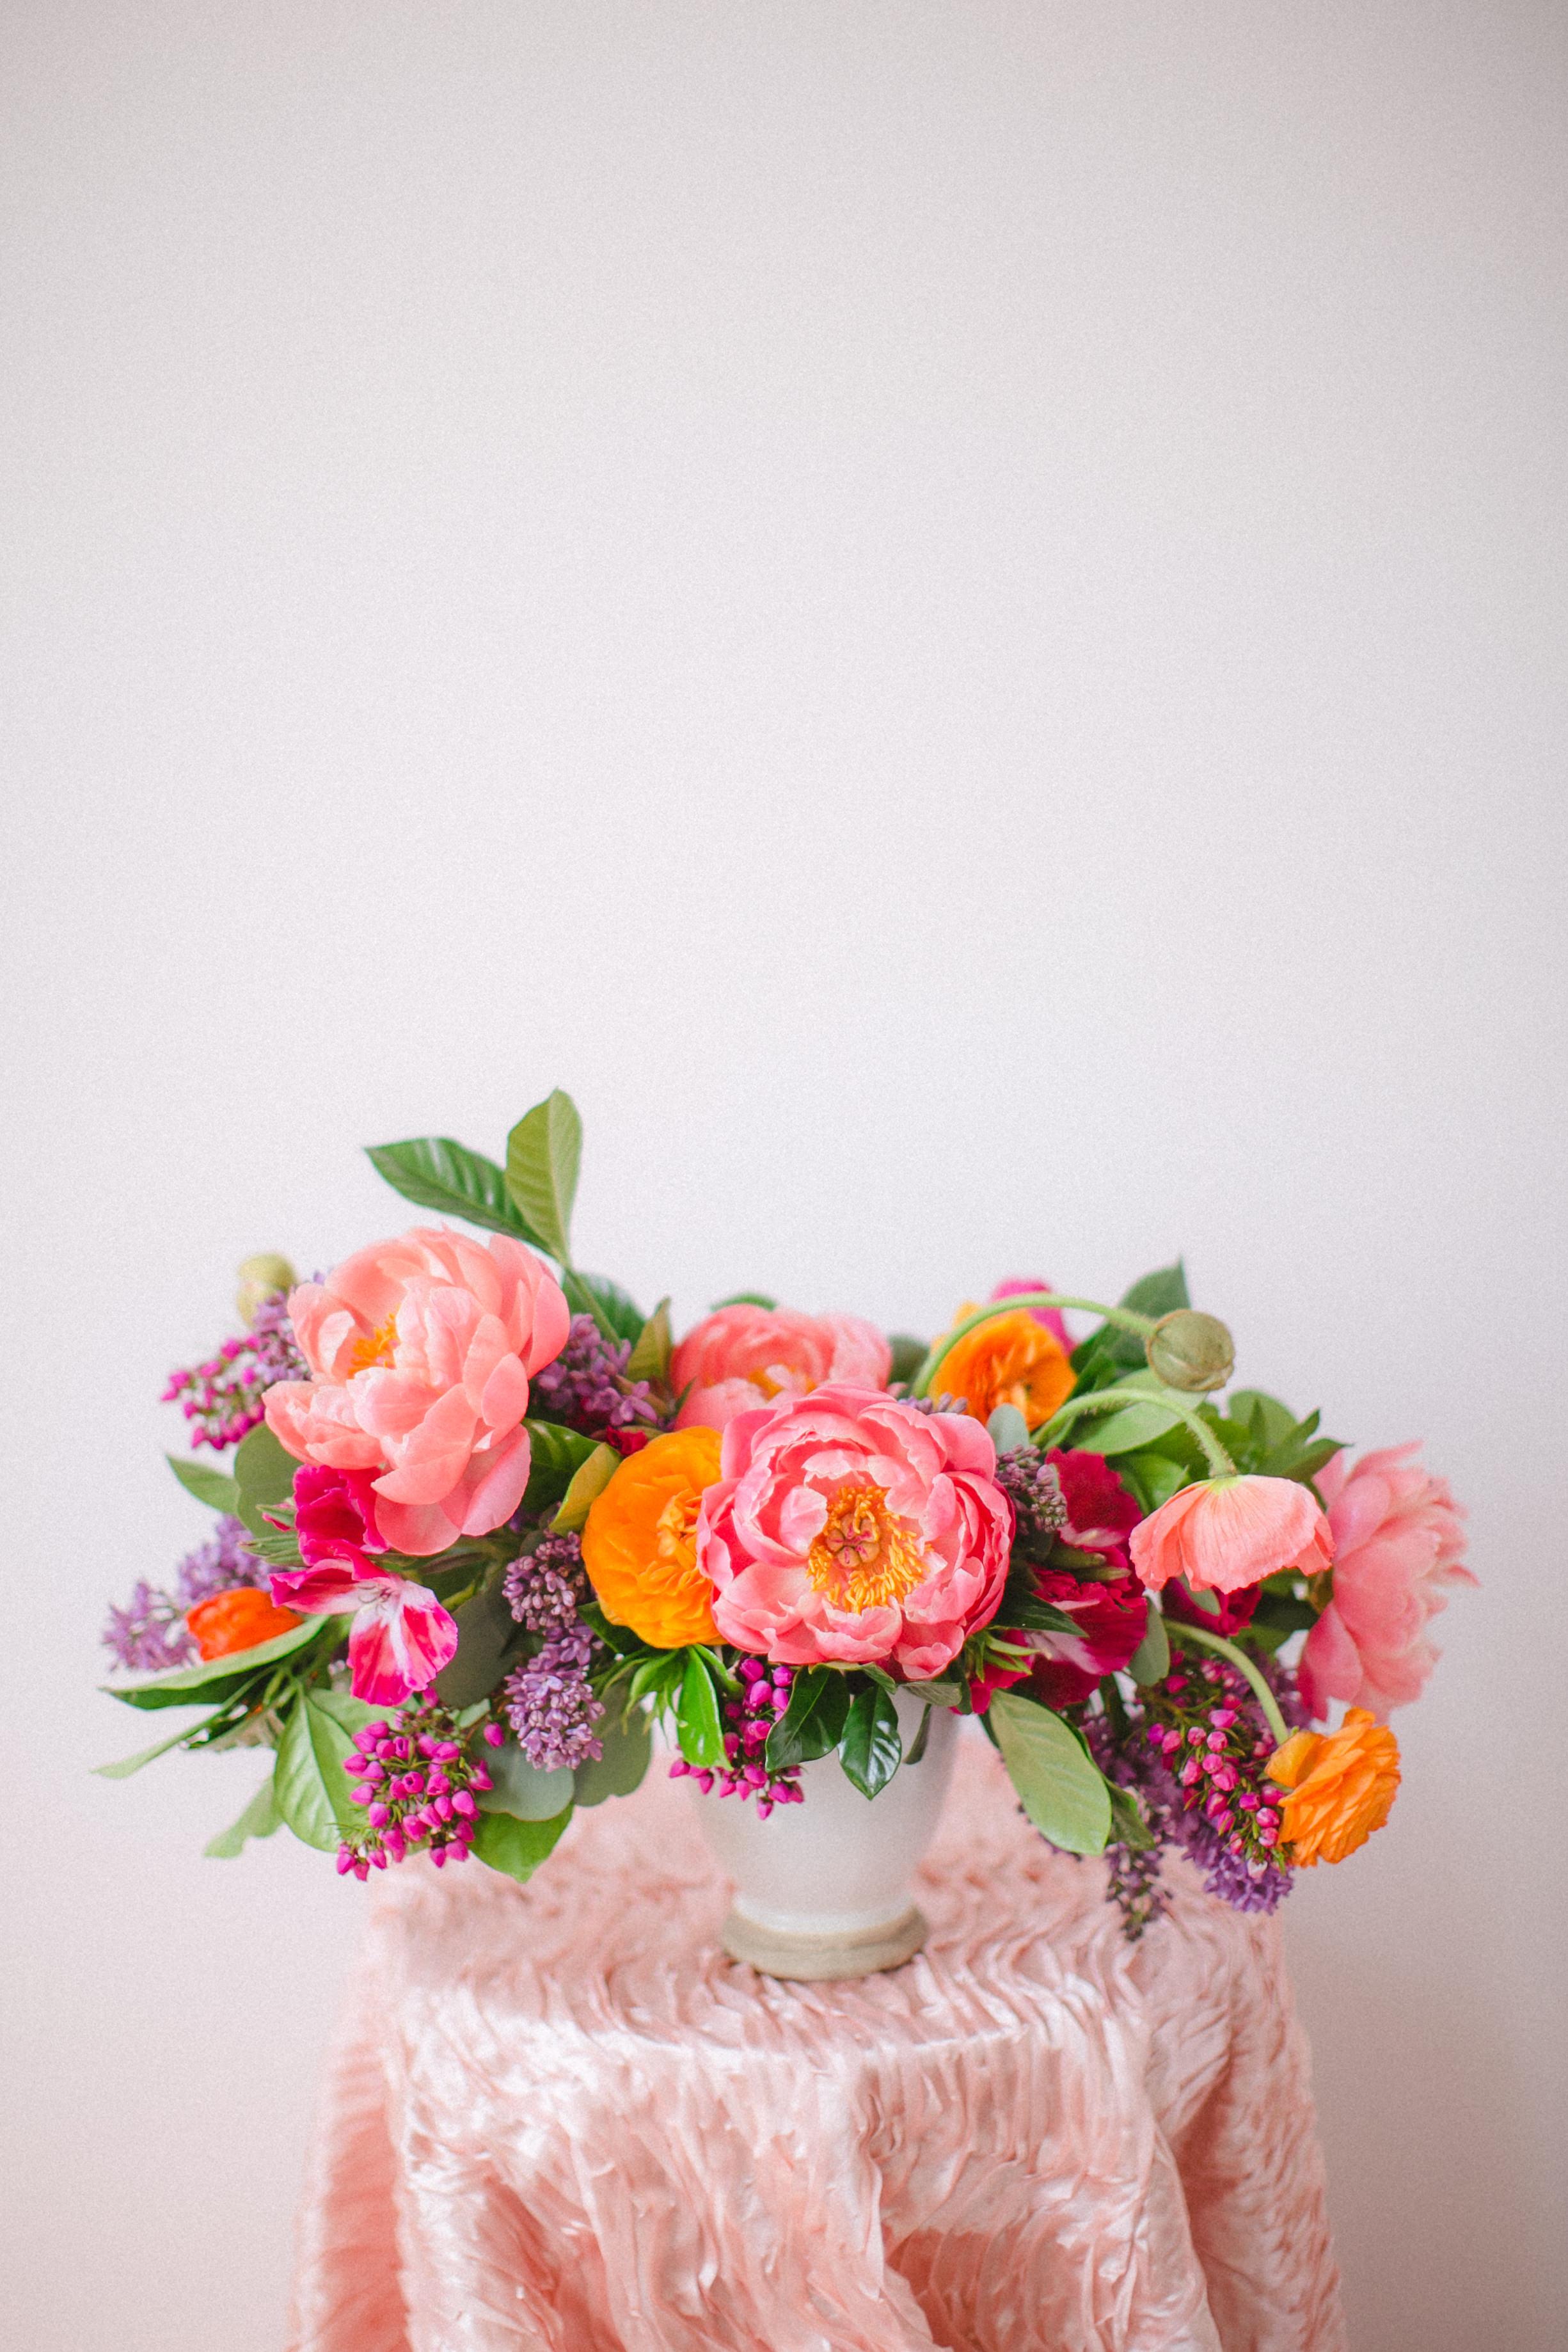 by Aimee Jobe Colorful Arrangement Wedding Bouquet Centerpiece-4.jpg